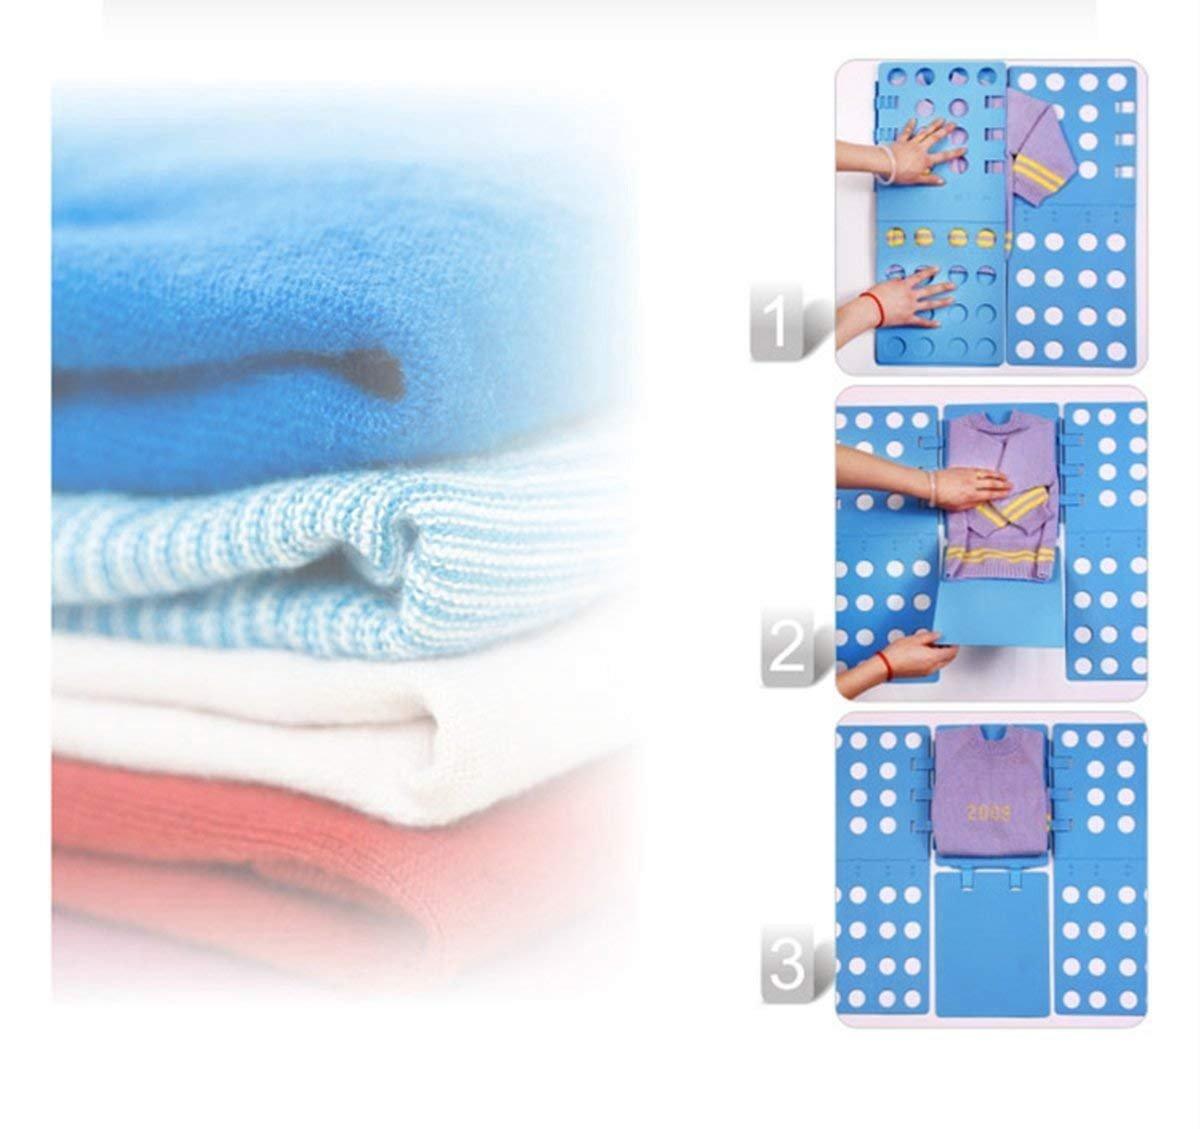 Pizarra plegable para doblar ropa (ajustable, para vestido, pantalones, toallas, camiseta), de Ecbrt: Amazon.es: Hogar